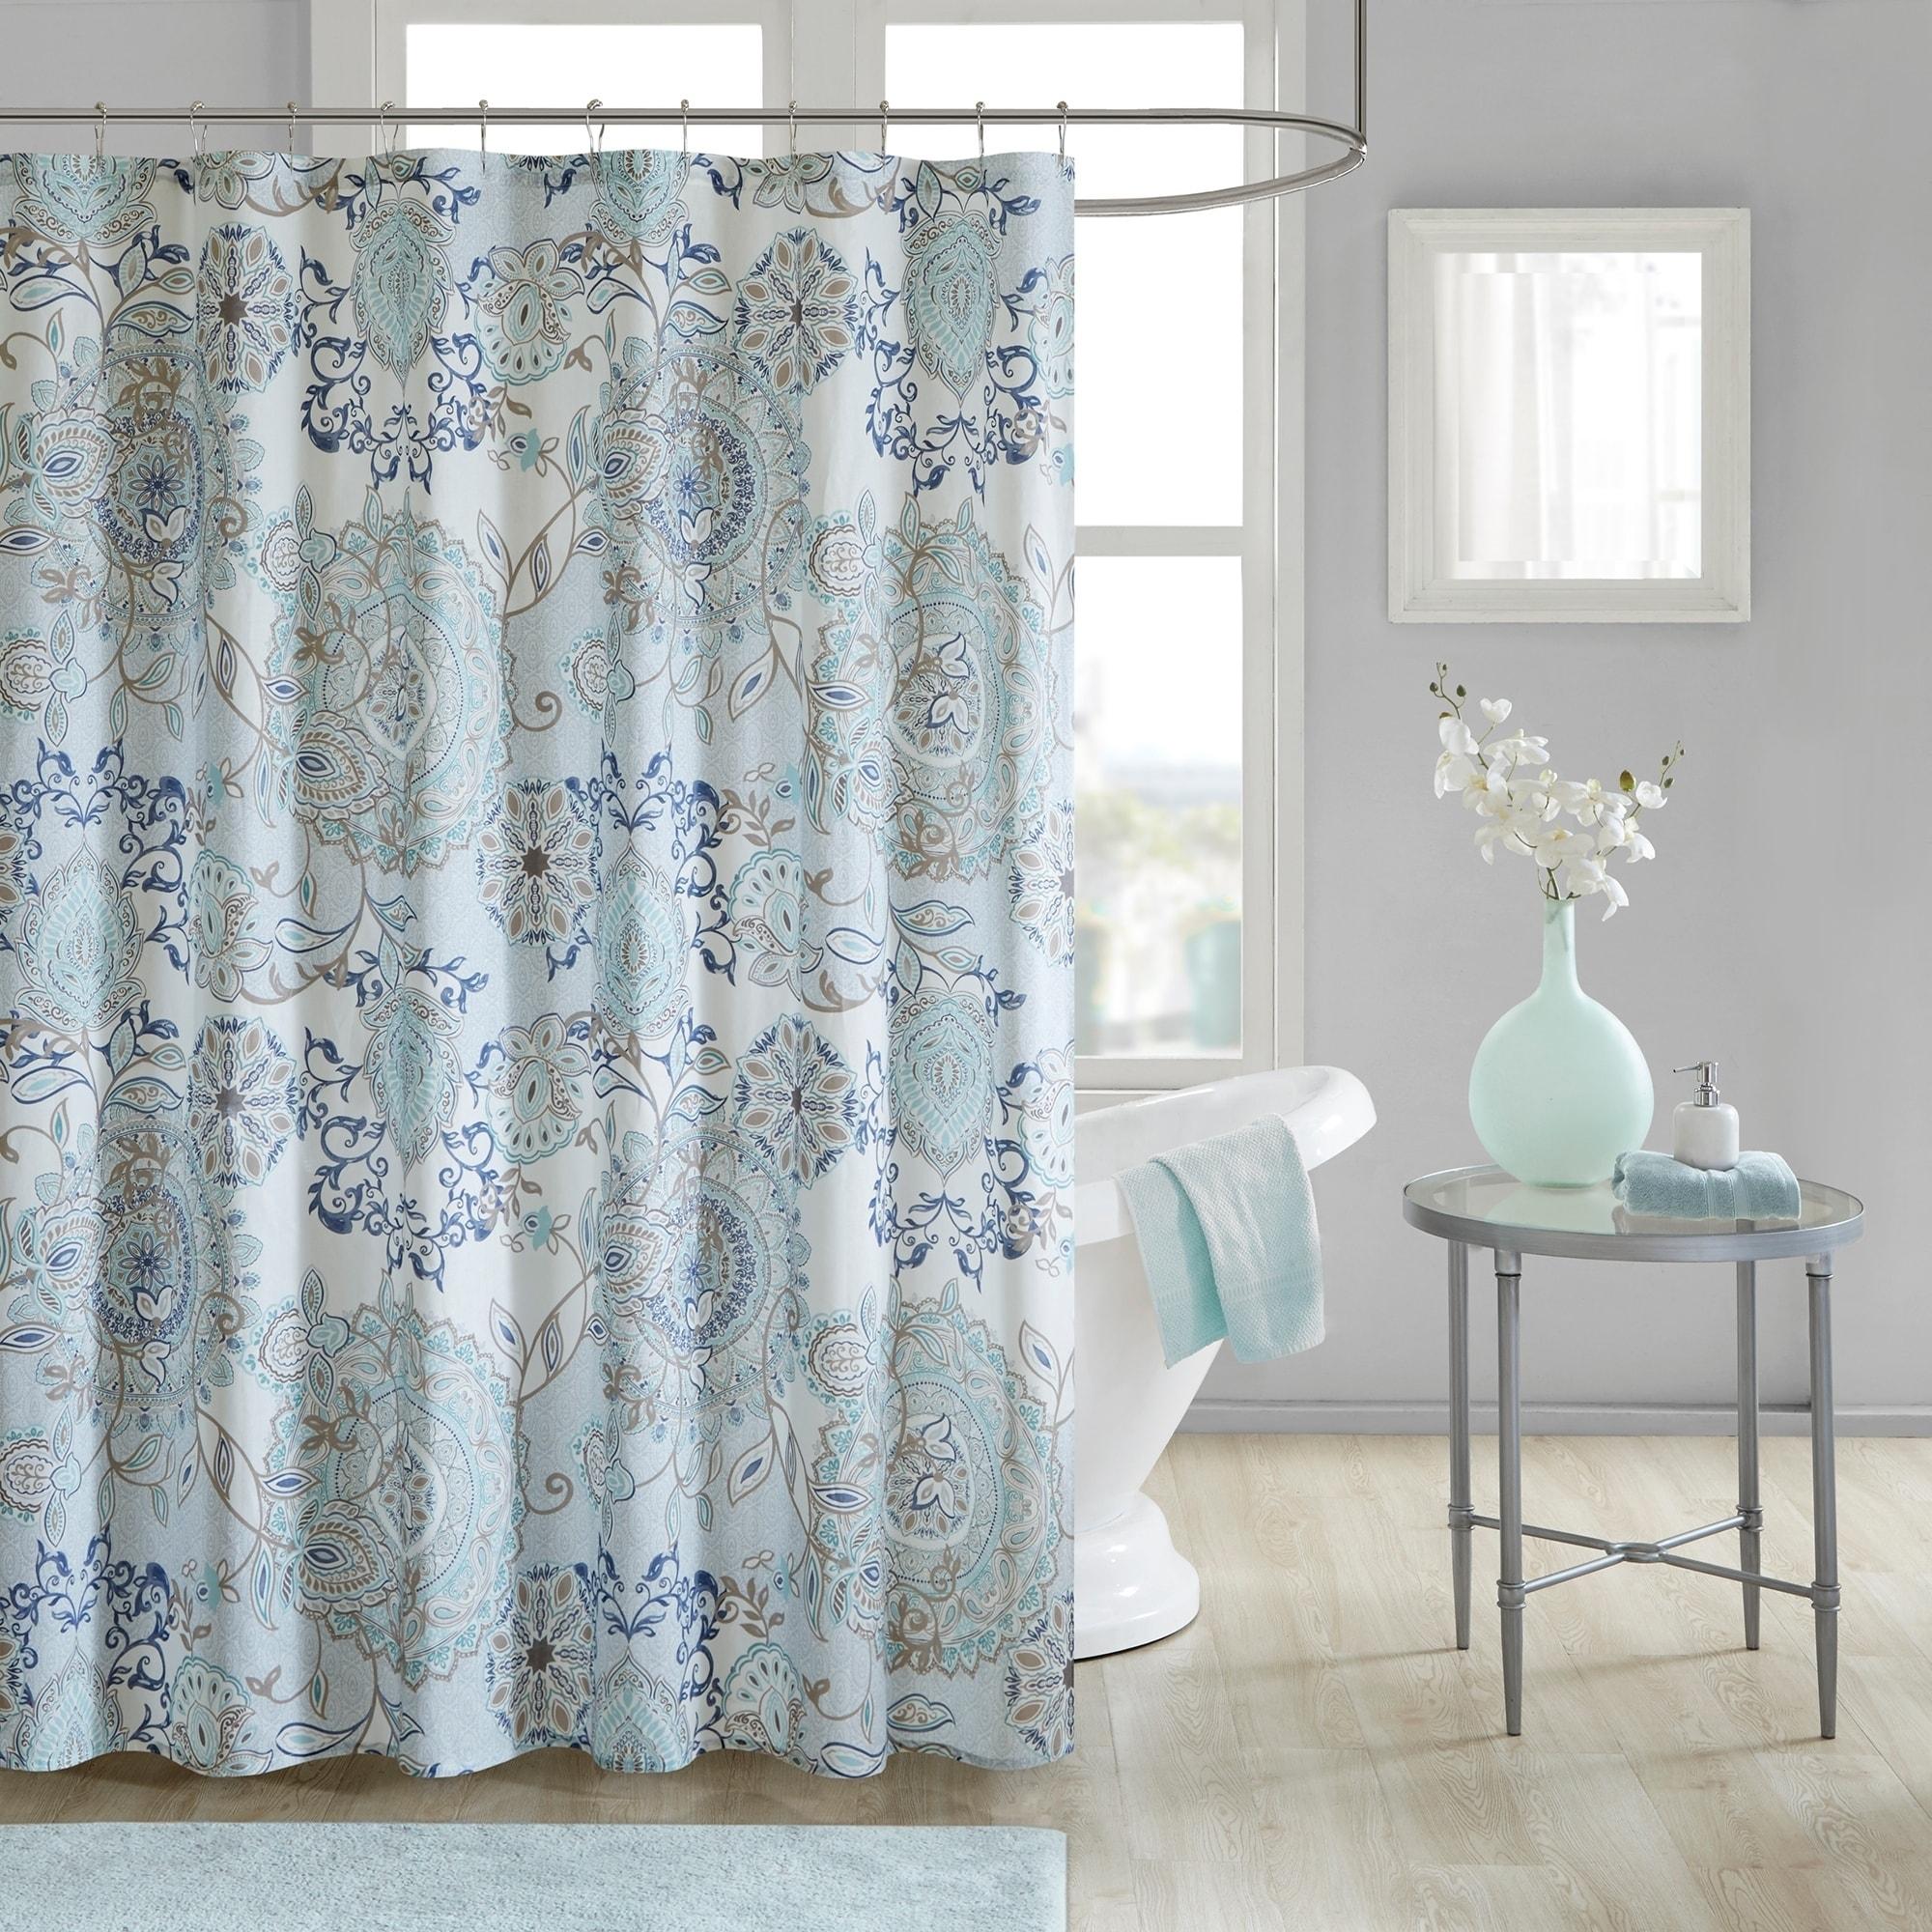 Shop Madison Park Loleta Blue Cotton Printed Shower Curtain